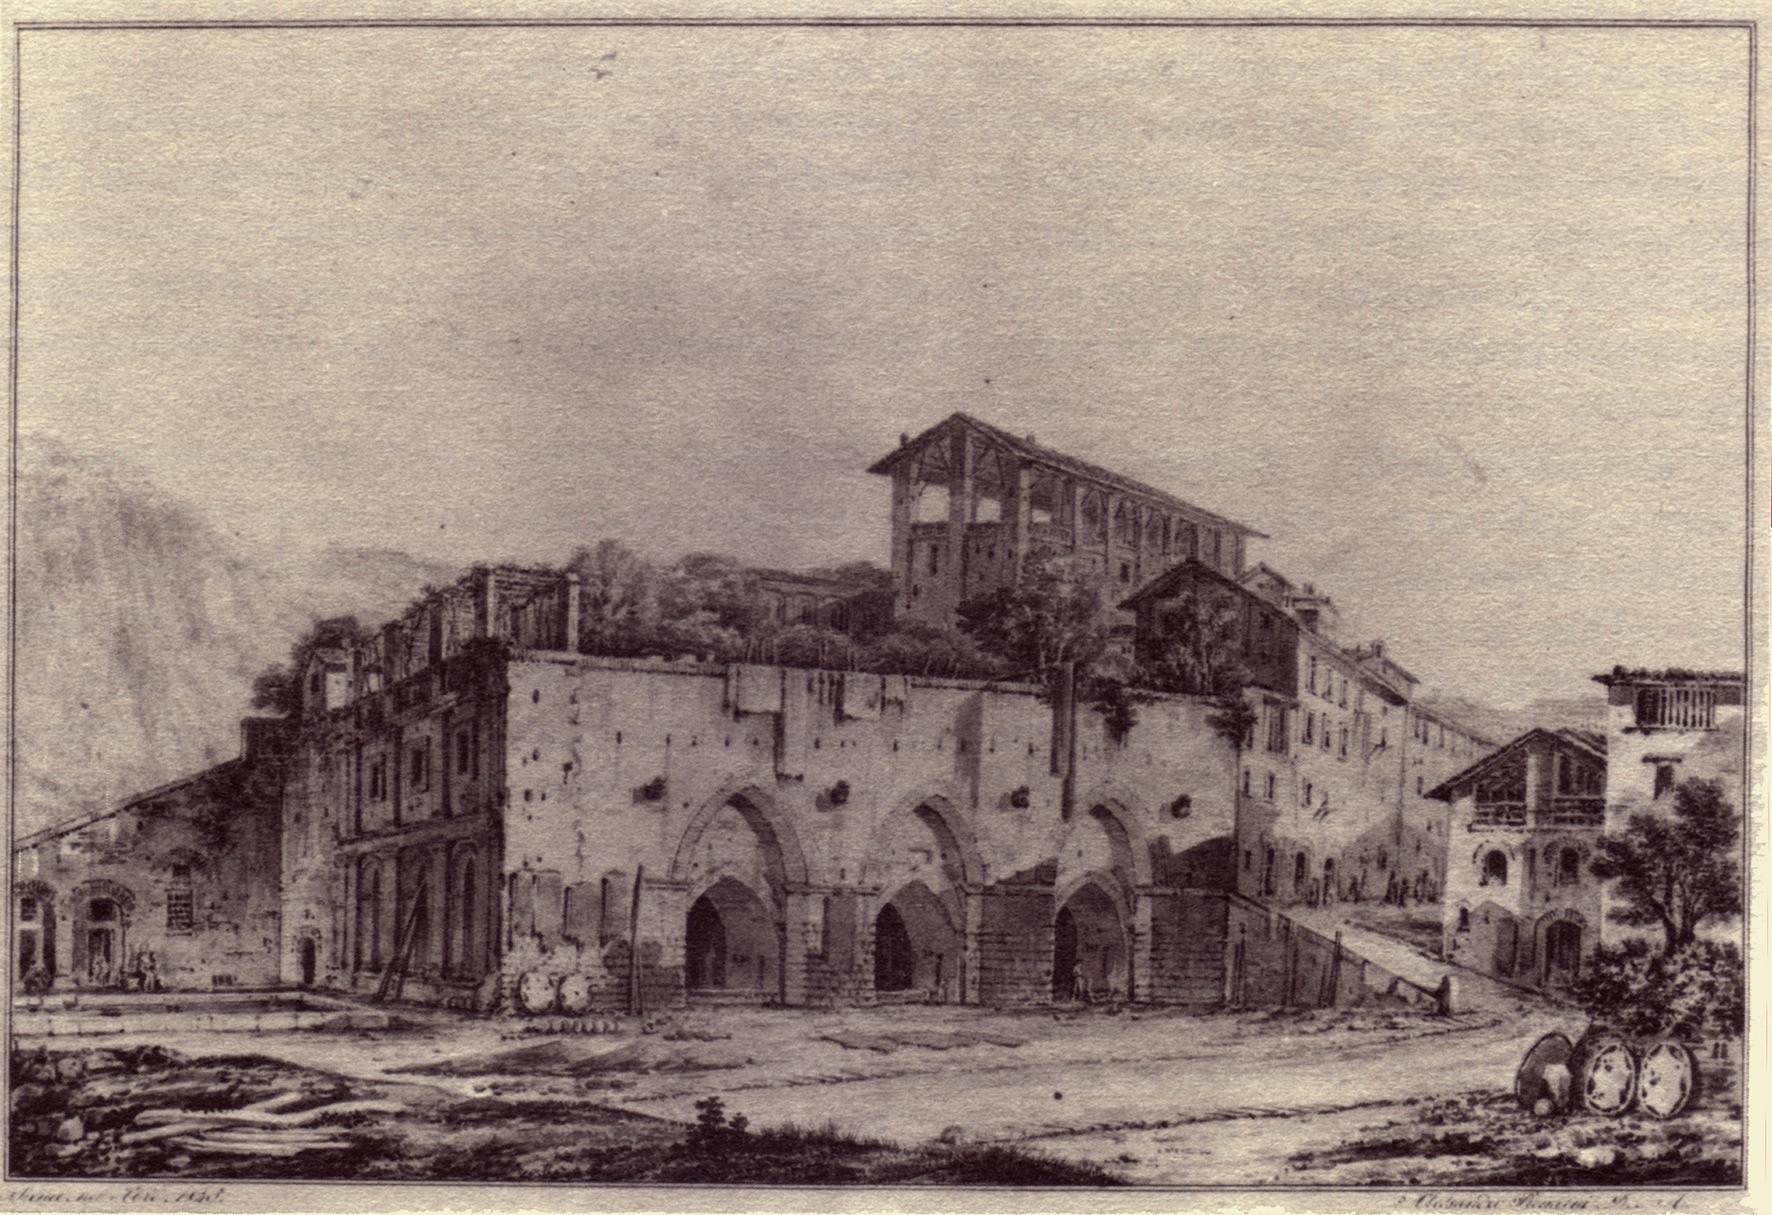 File:Fontebranda - Alessandro Romani (1845).jpg